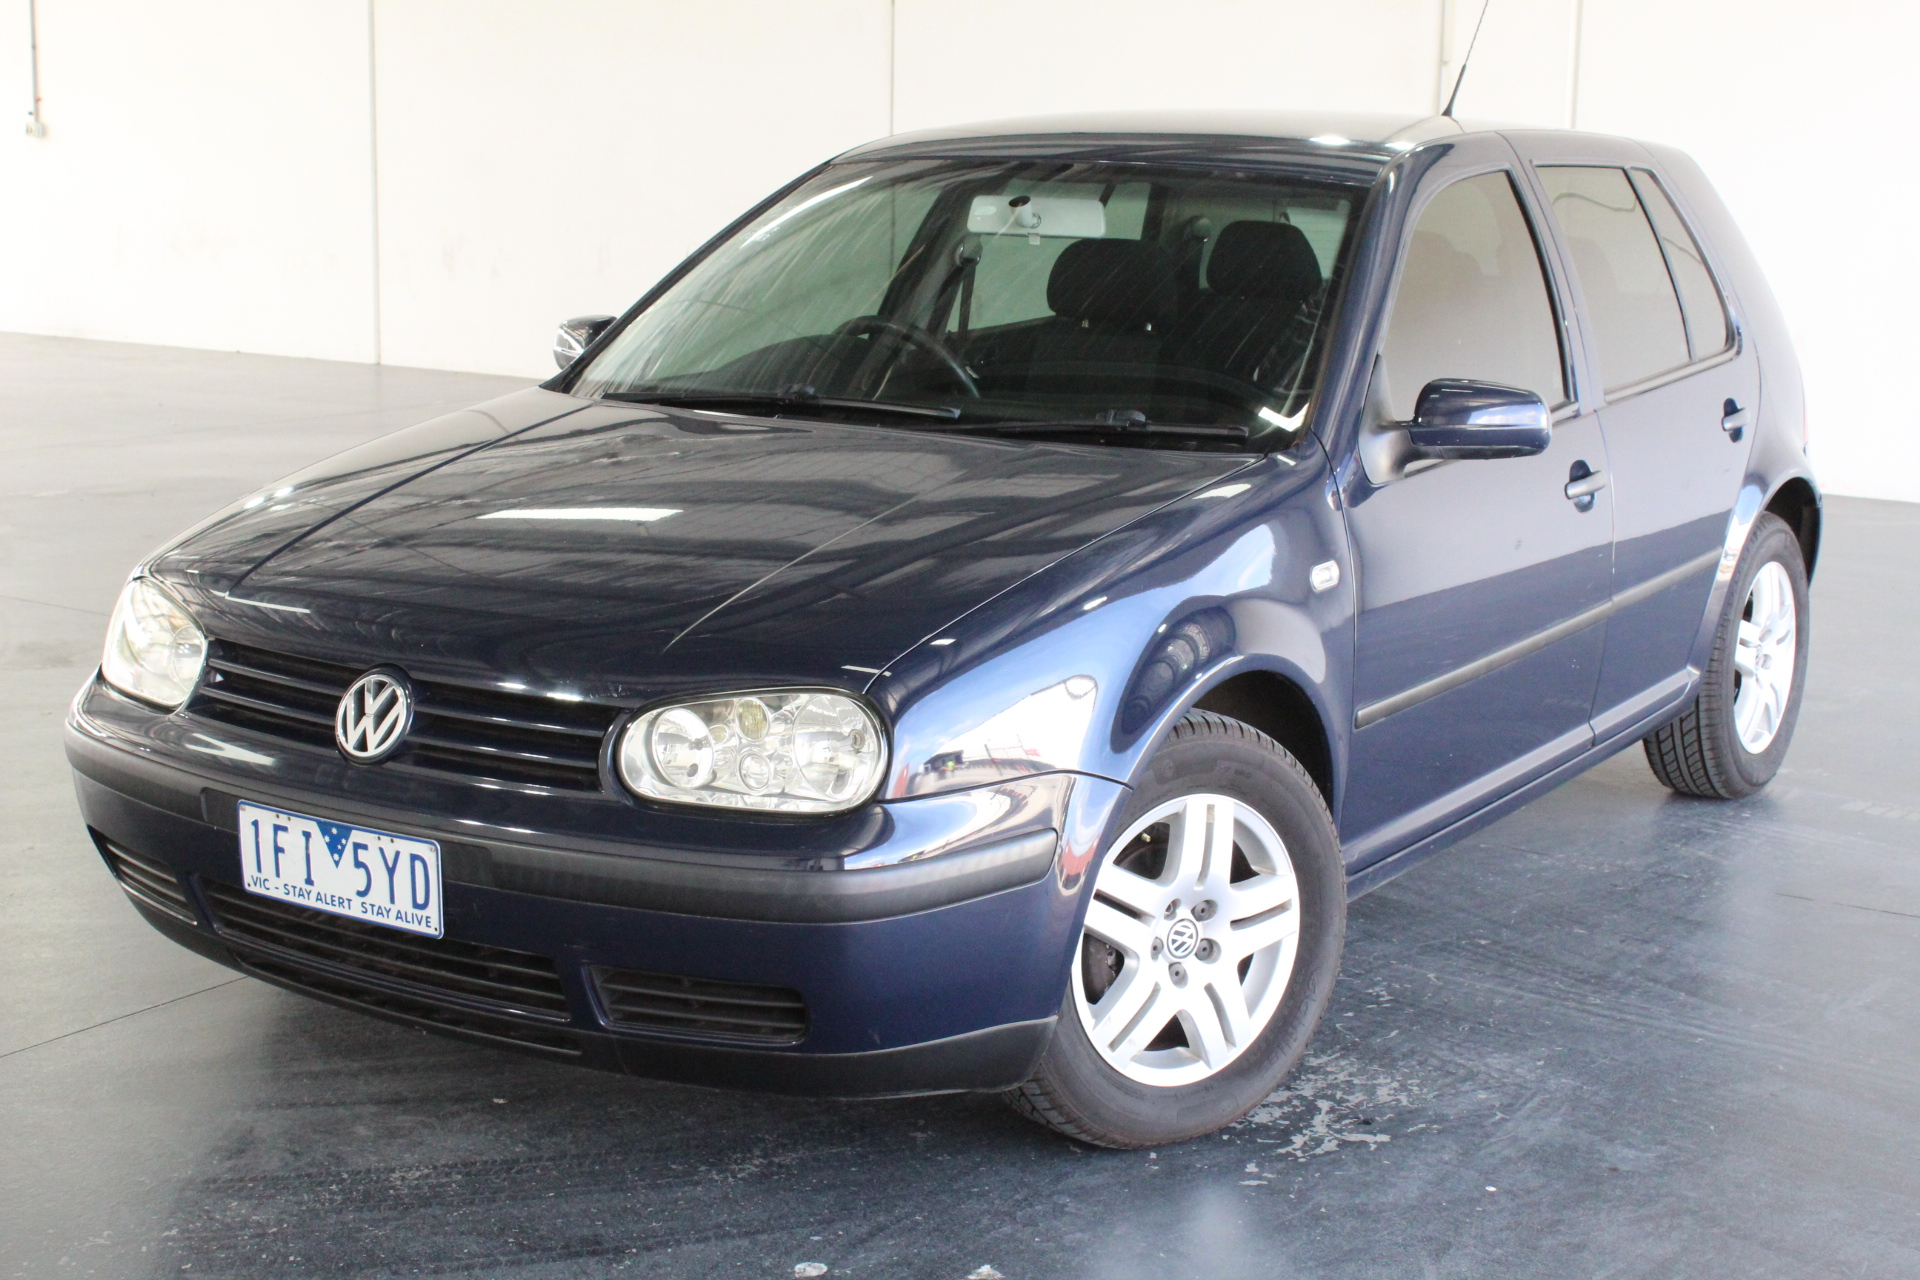 2003 Volkswagen Golf 1.6 Generation A4 Automatic Hatchback